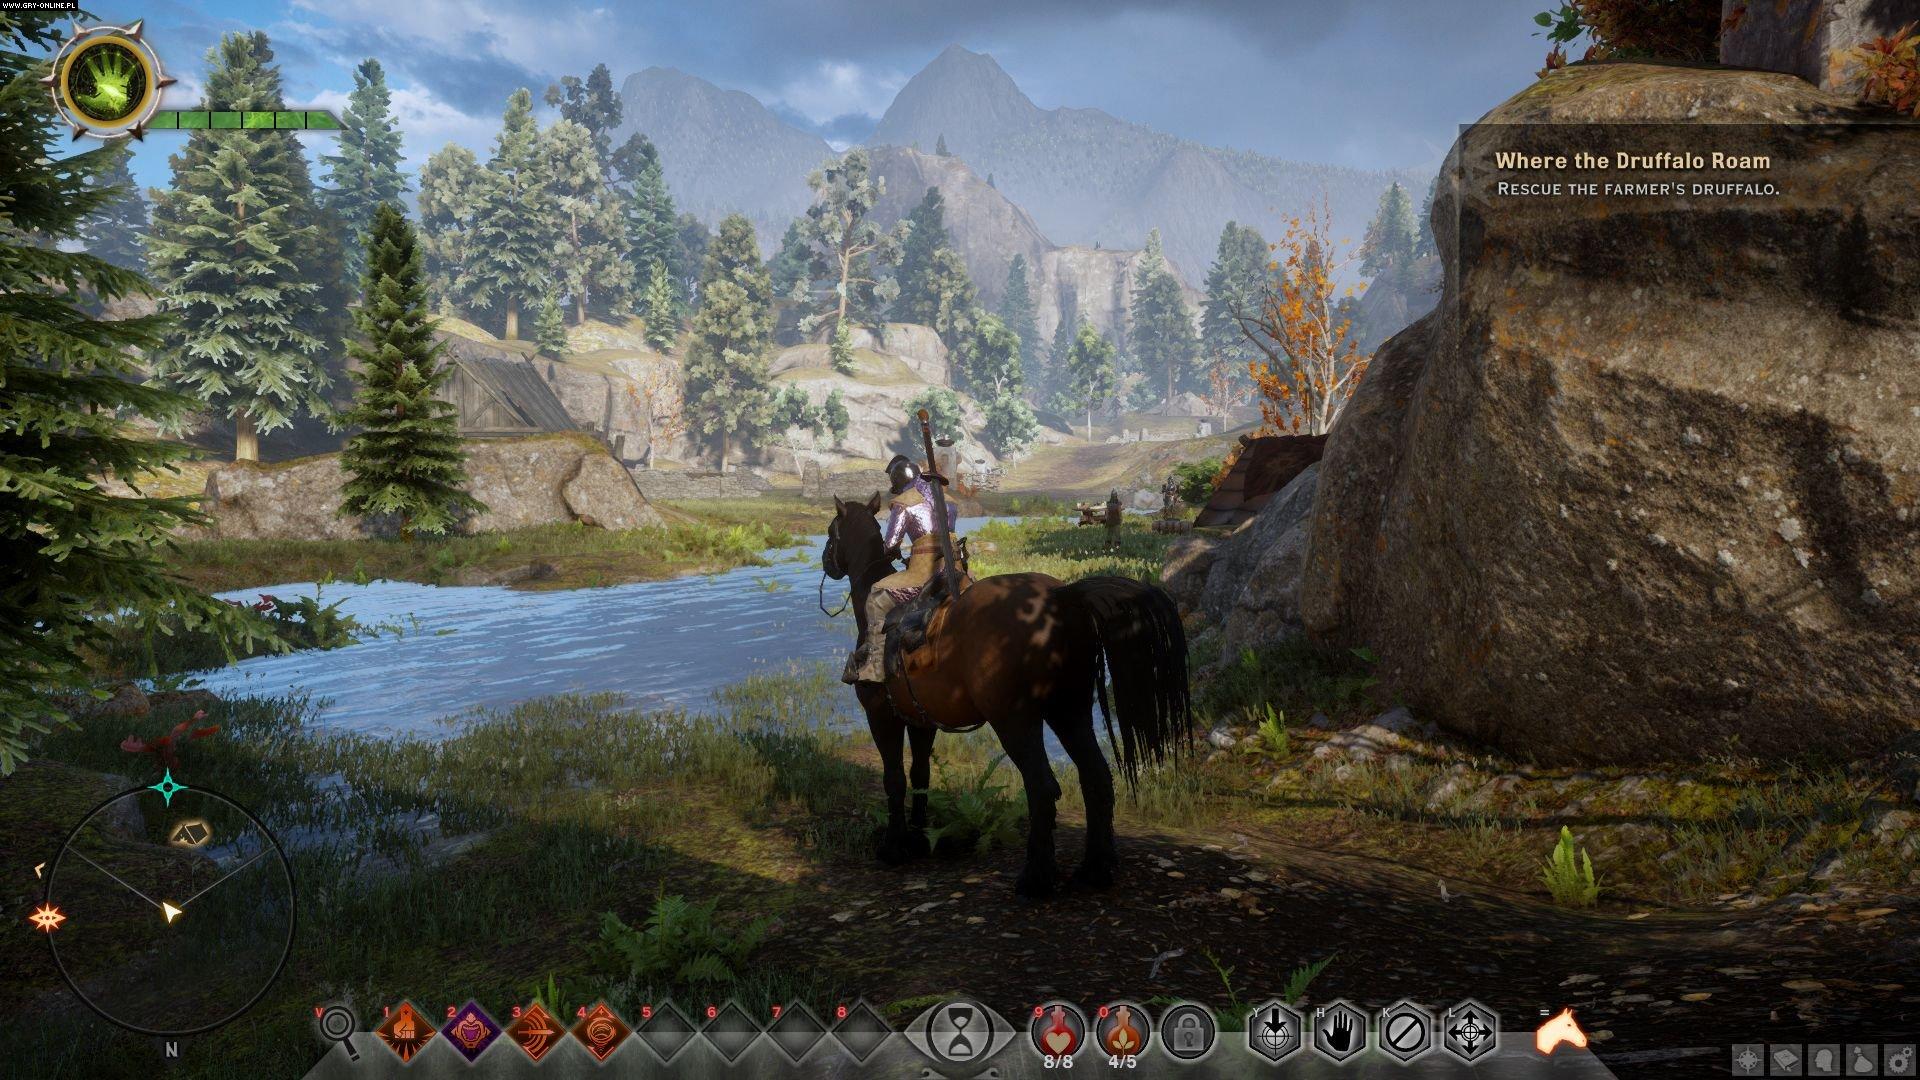 Dragon Age: Inquisition PC, X360, PS3 Games Image 3/225, BioWare Corporation, Electronic Arts Inc.